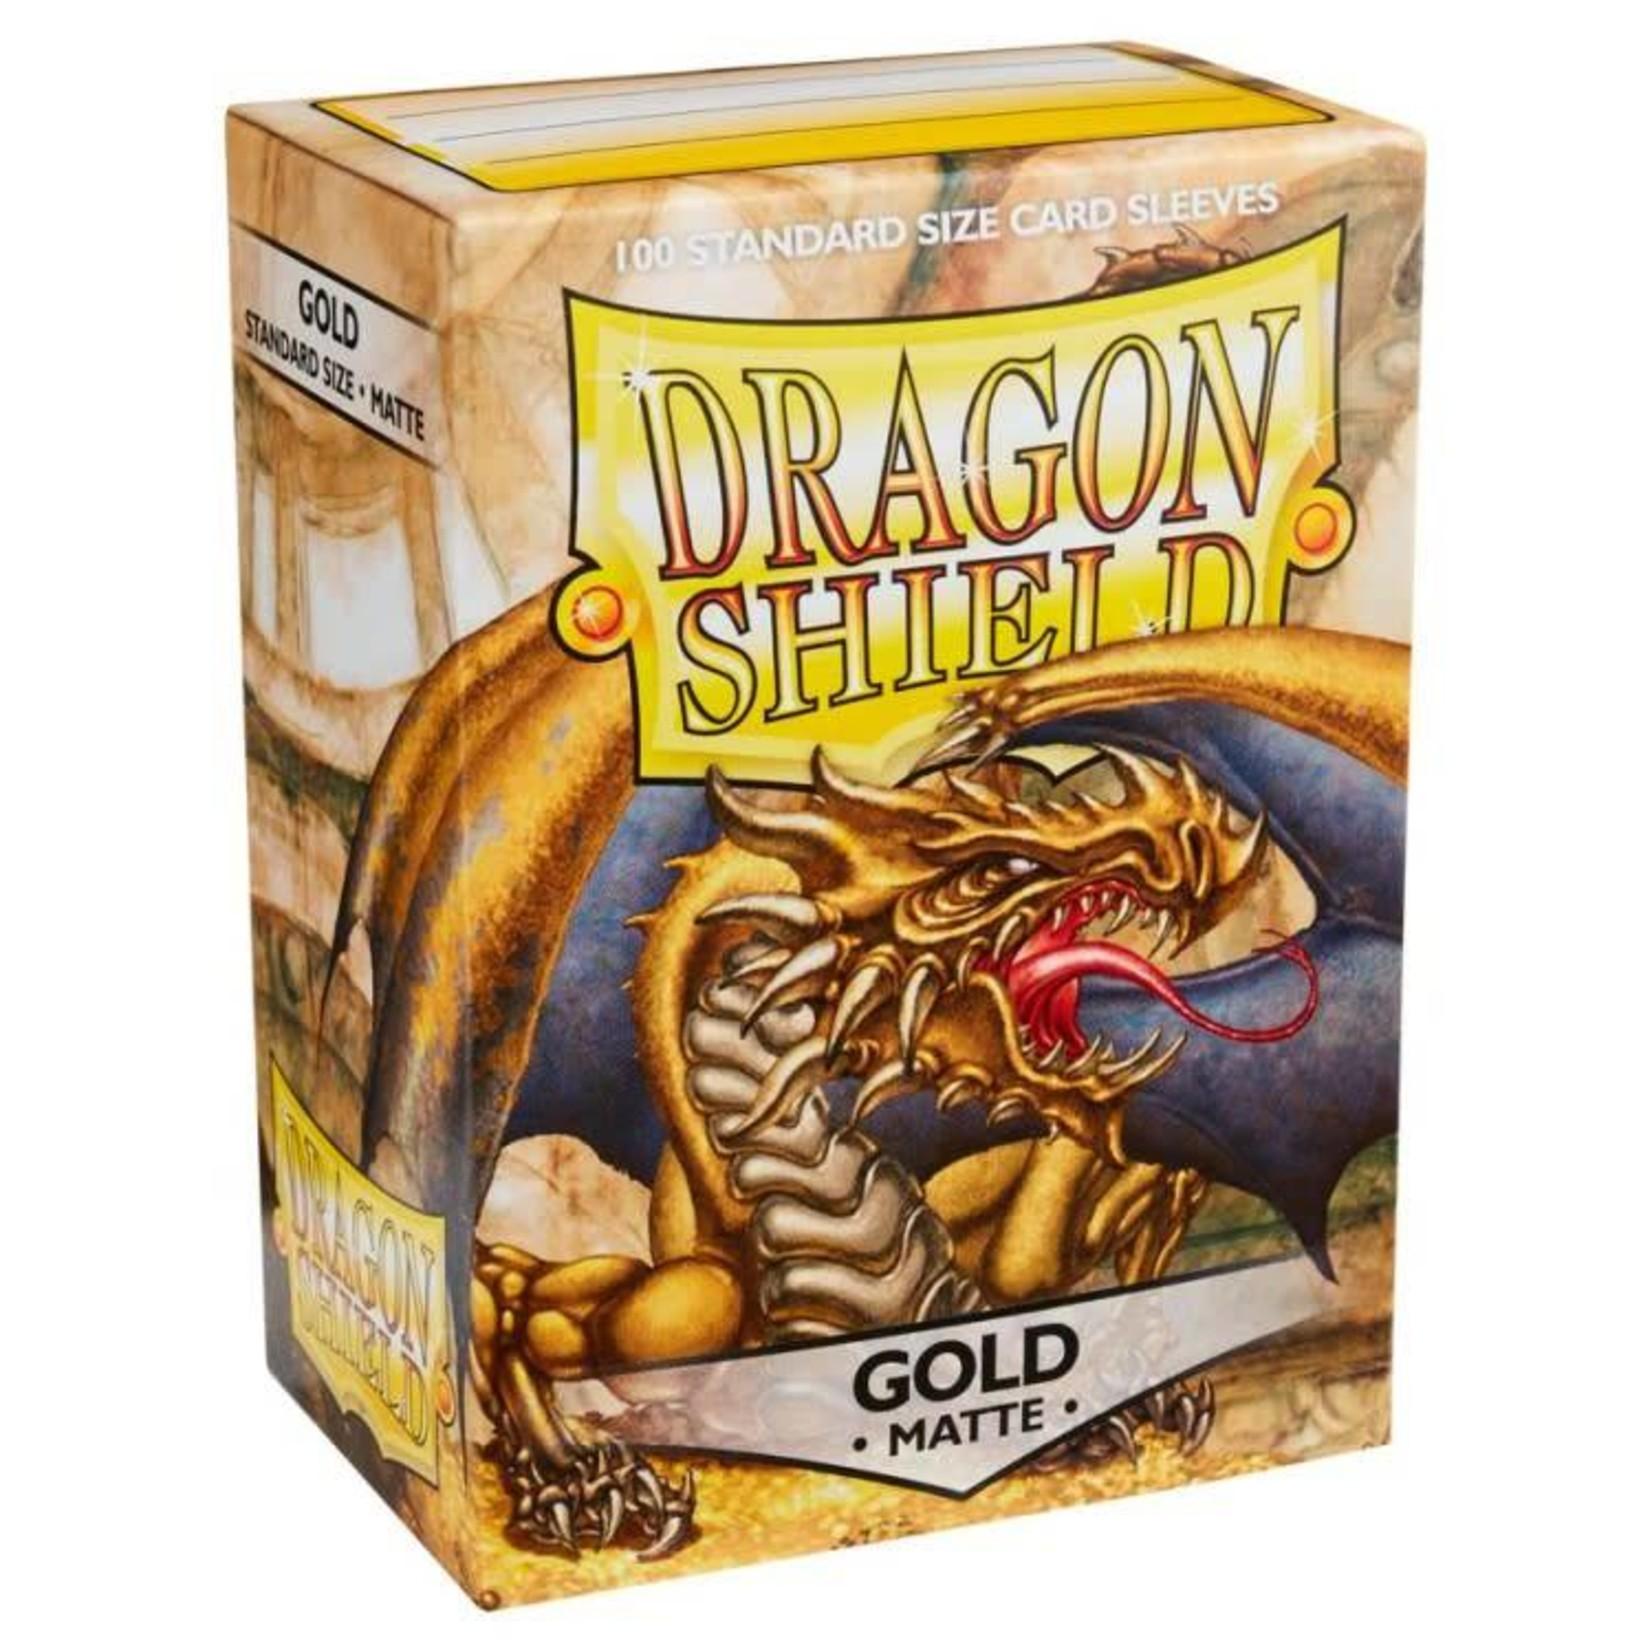 Arcane Tinman Dragon Shields: Cards Sleeves -  Gold Matte (100)